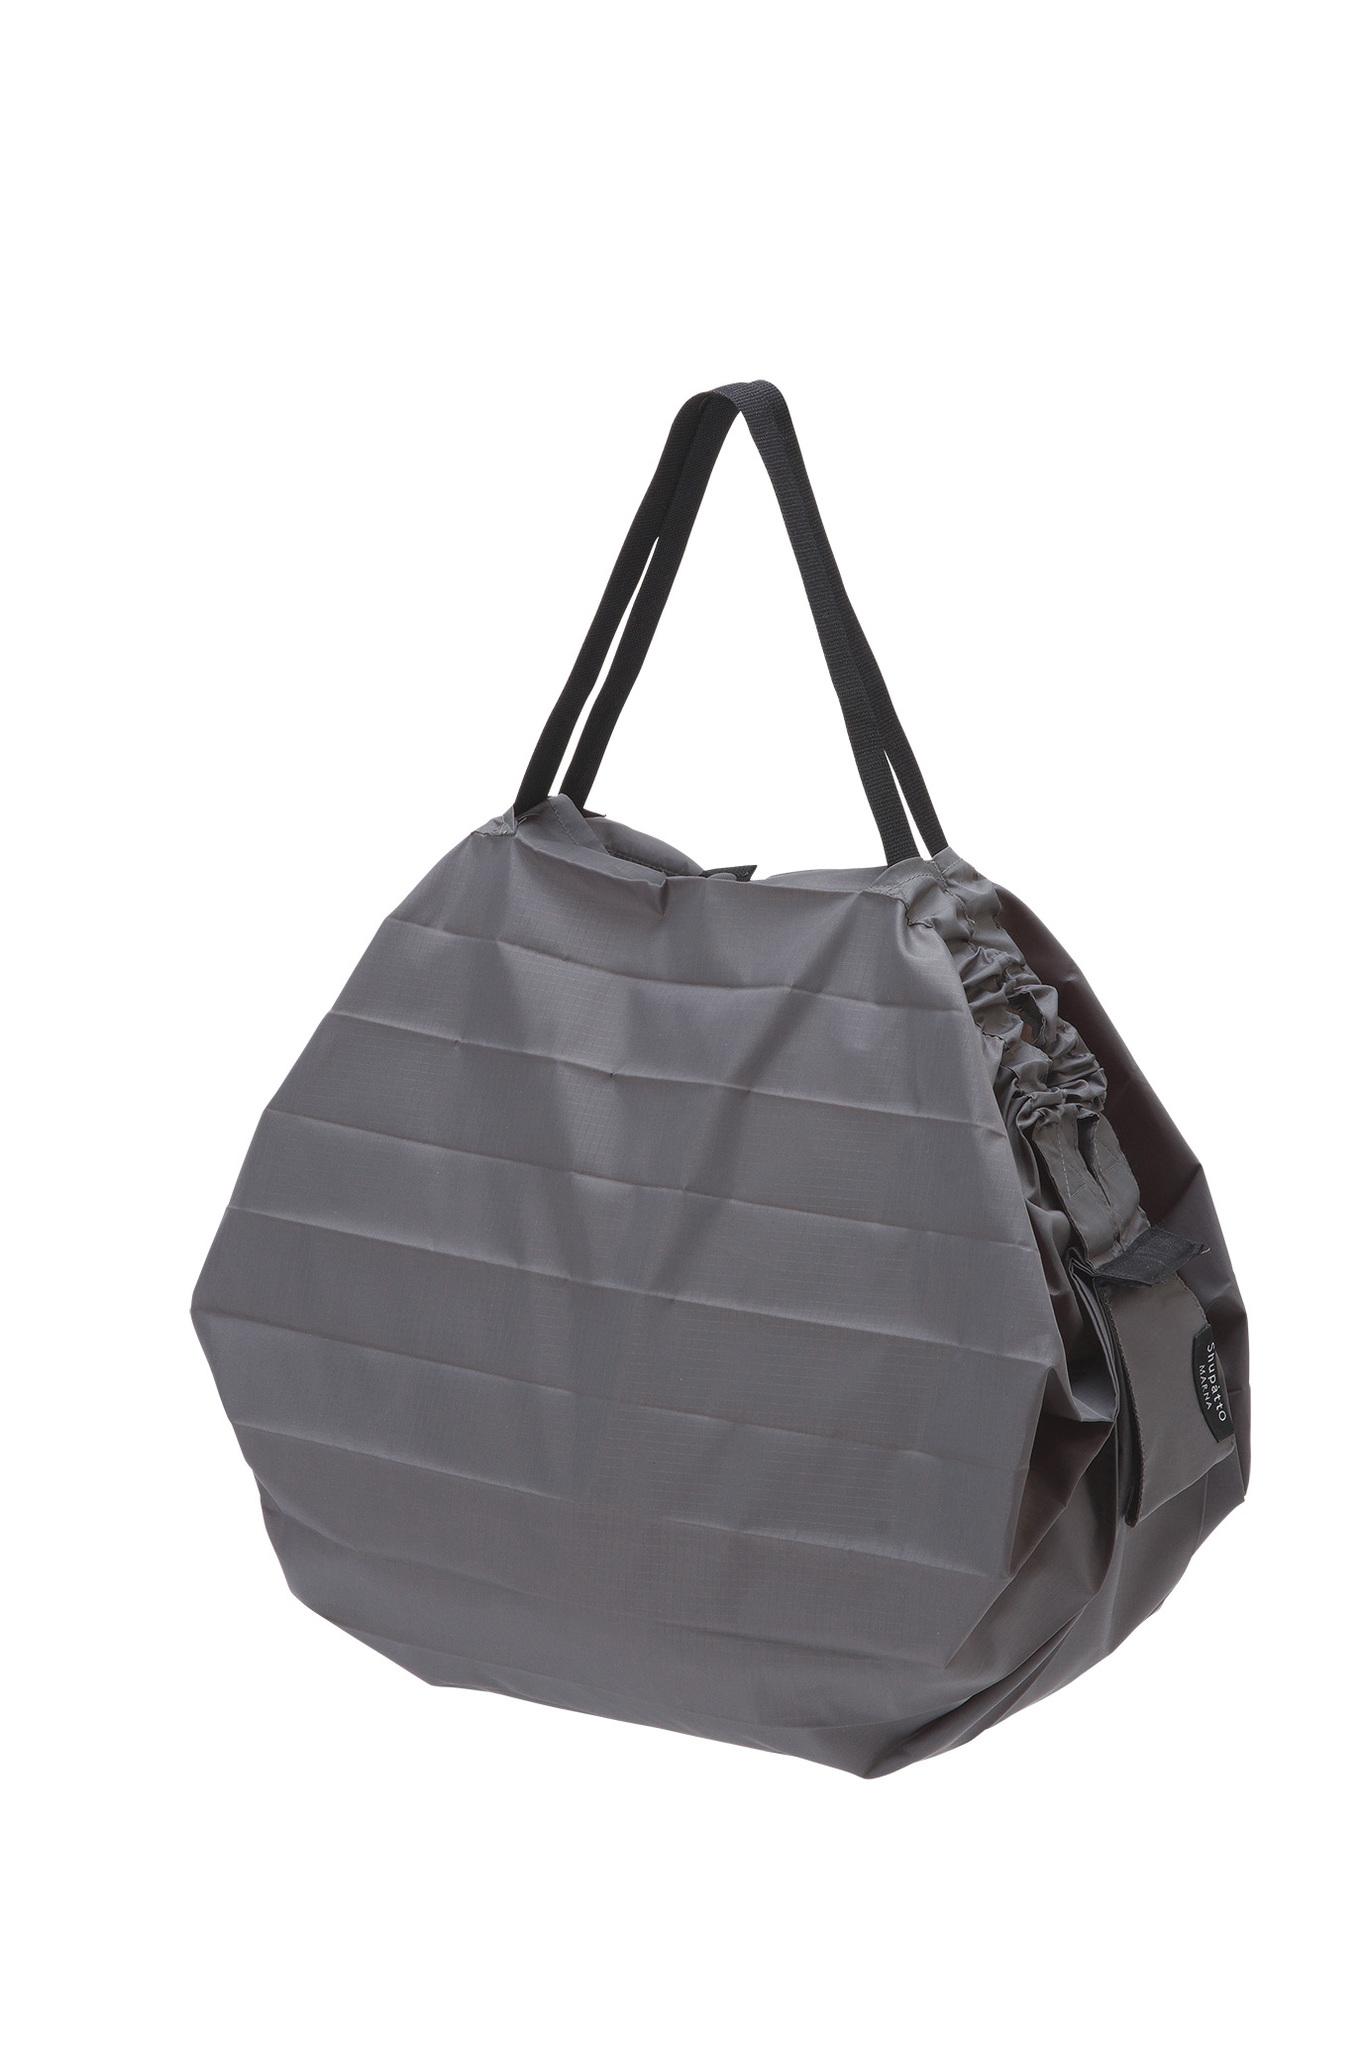 SUMI (Charcoal), Grau, Grösse M - gefaltet 8x6 cm,